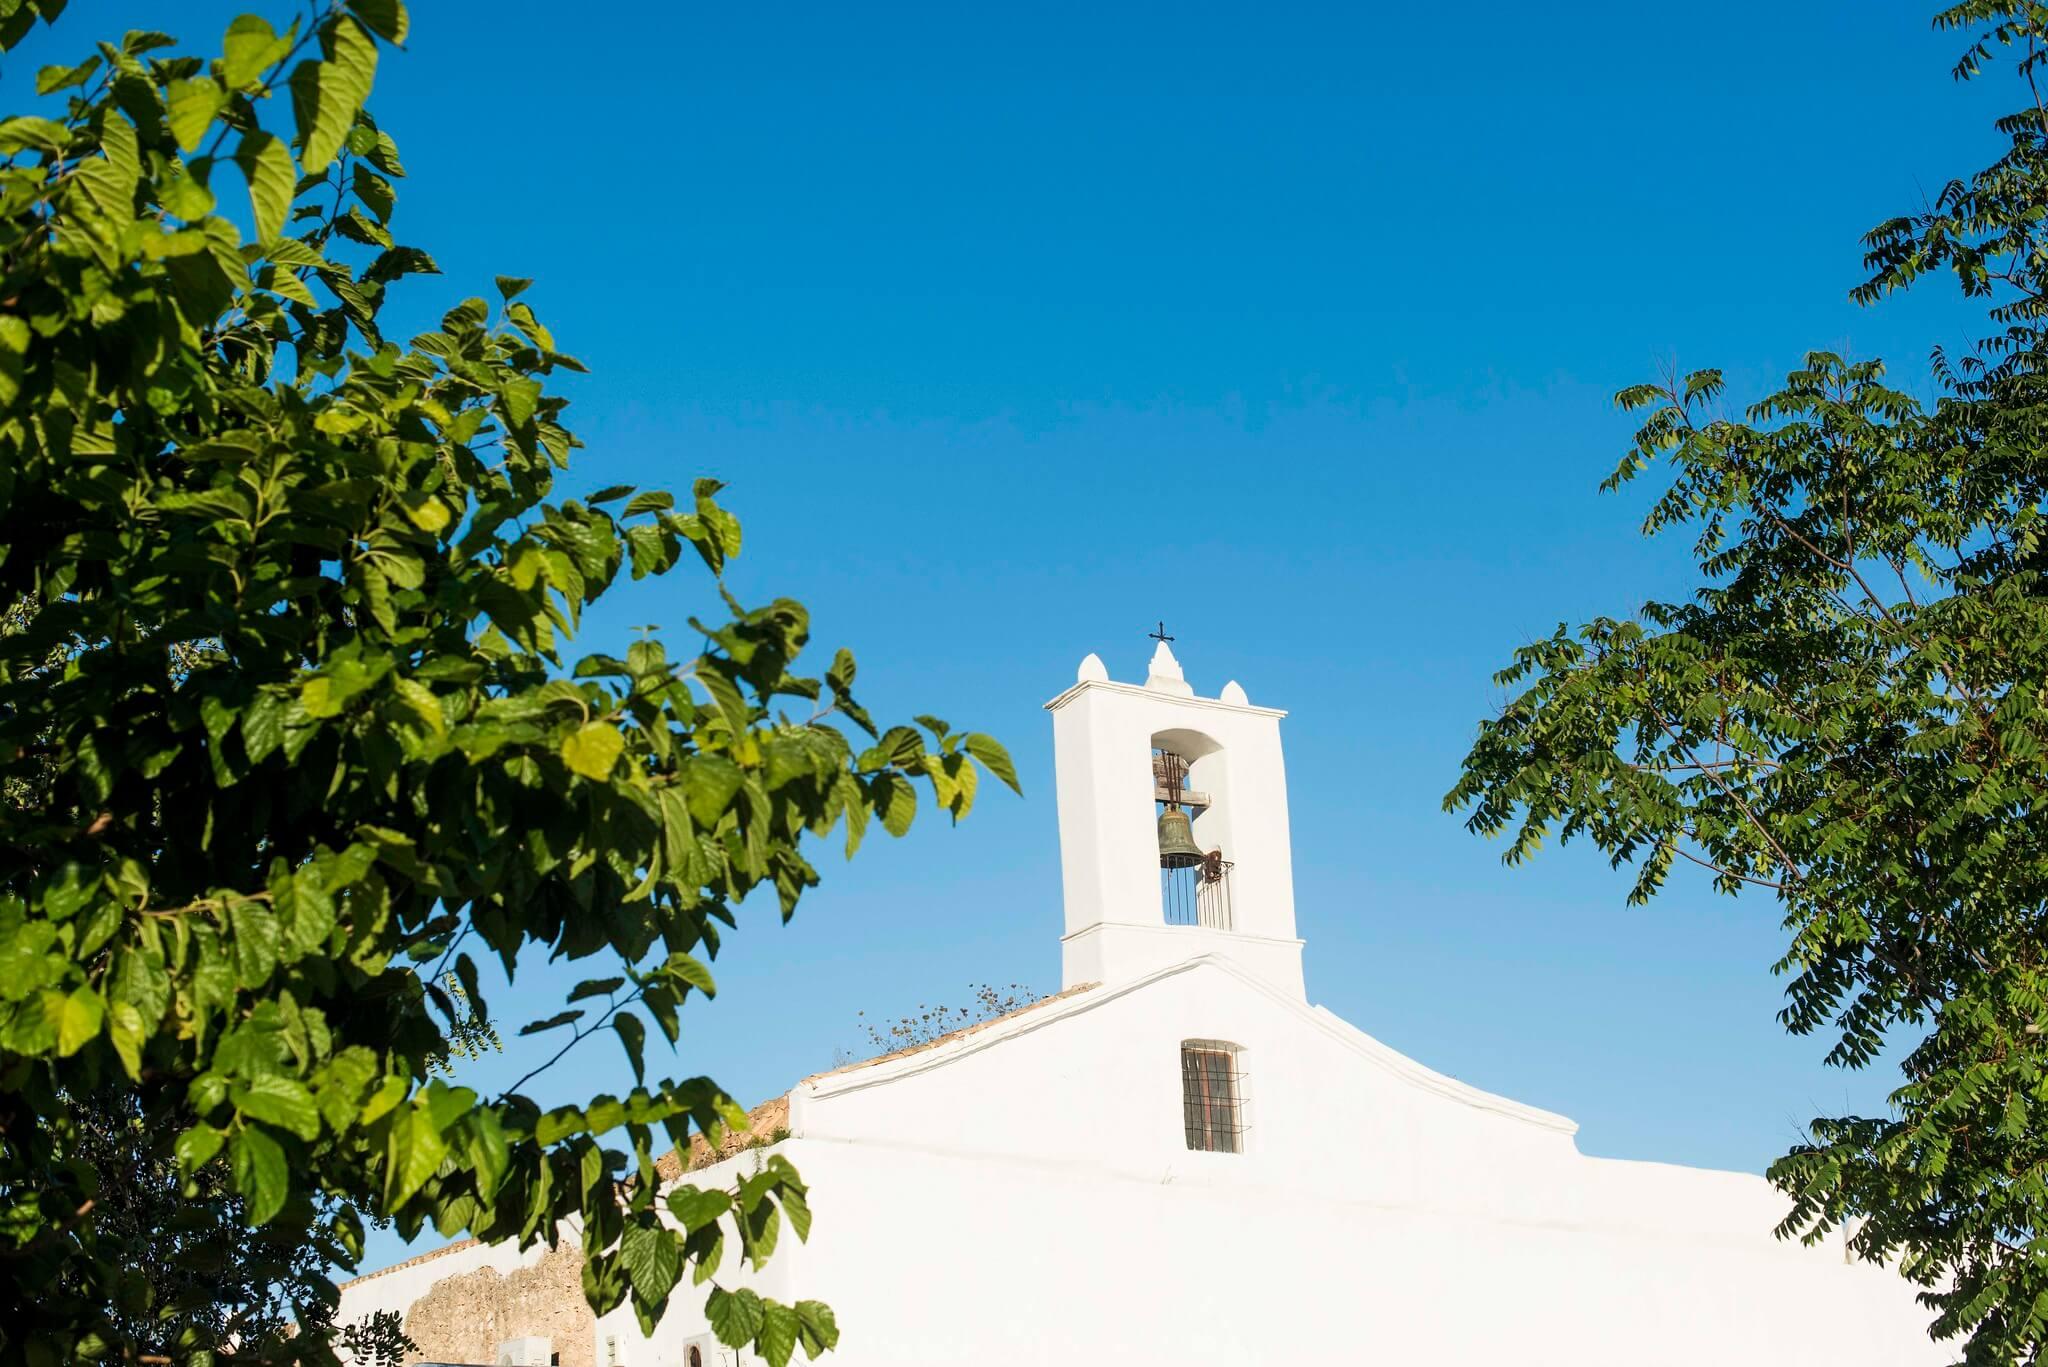 https://www.white-ibiza.com/wp-content/uploads/2020/05/white-ibiza-villas-where-to-stay-san-lorenzo-01.jpg